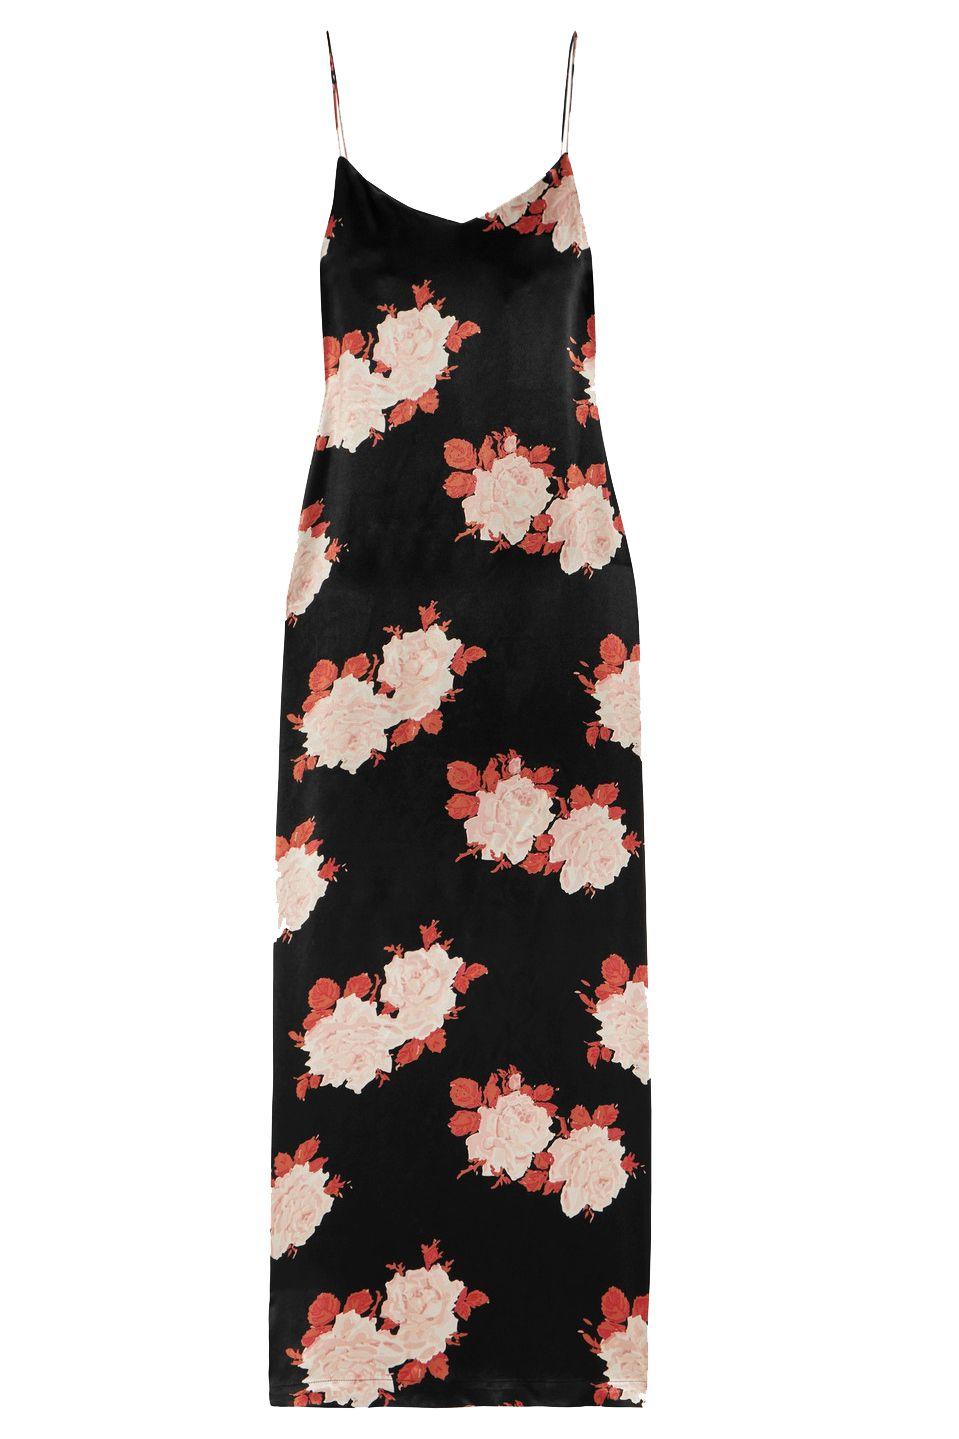 A rose-print dress